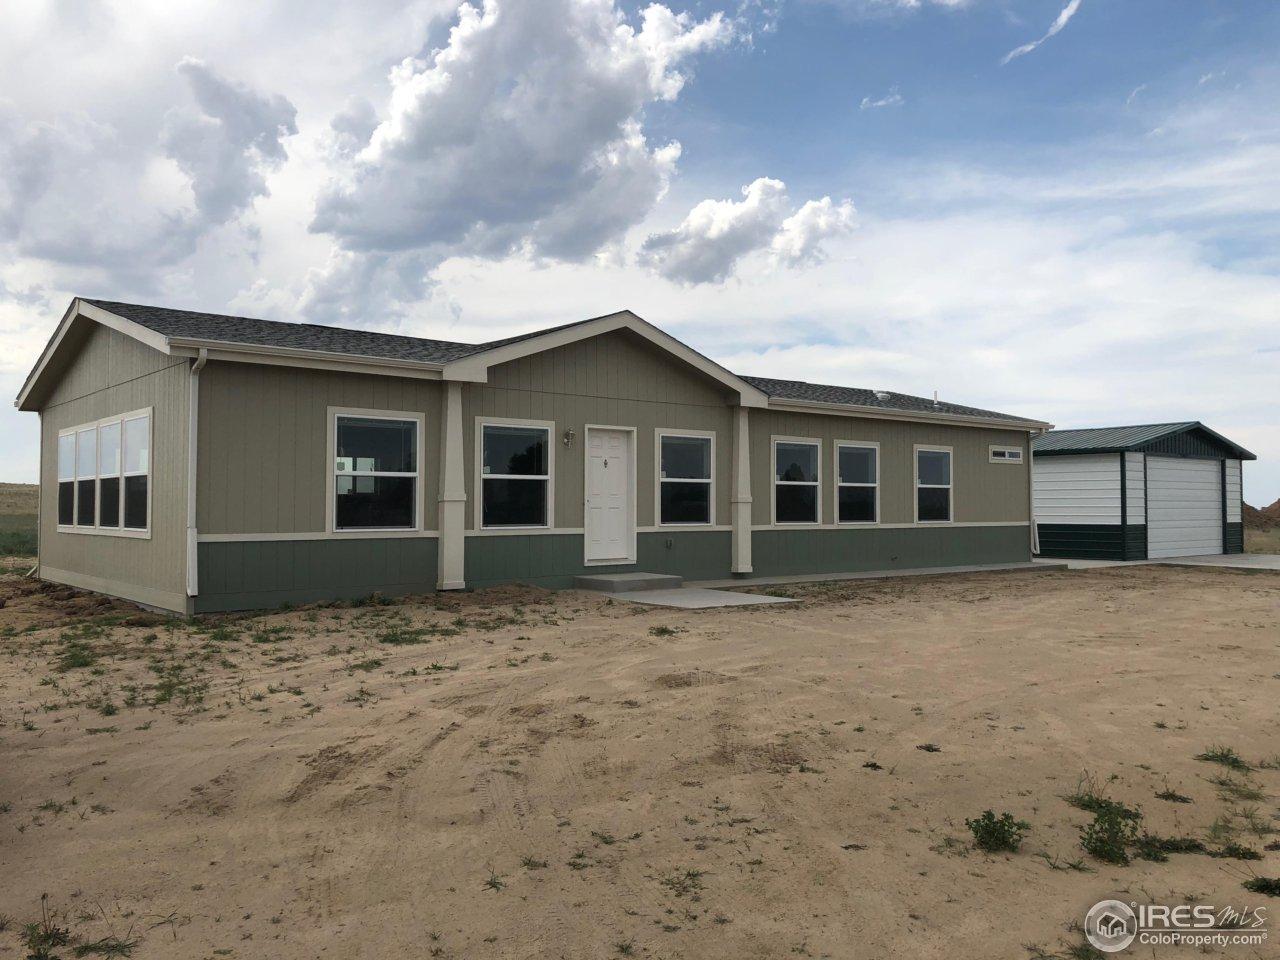 16 E Ranch Rd, Wiggins, CO 80654